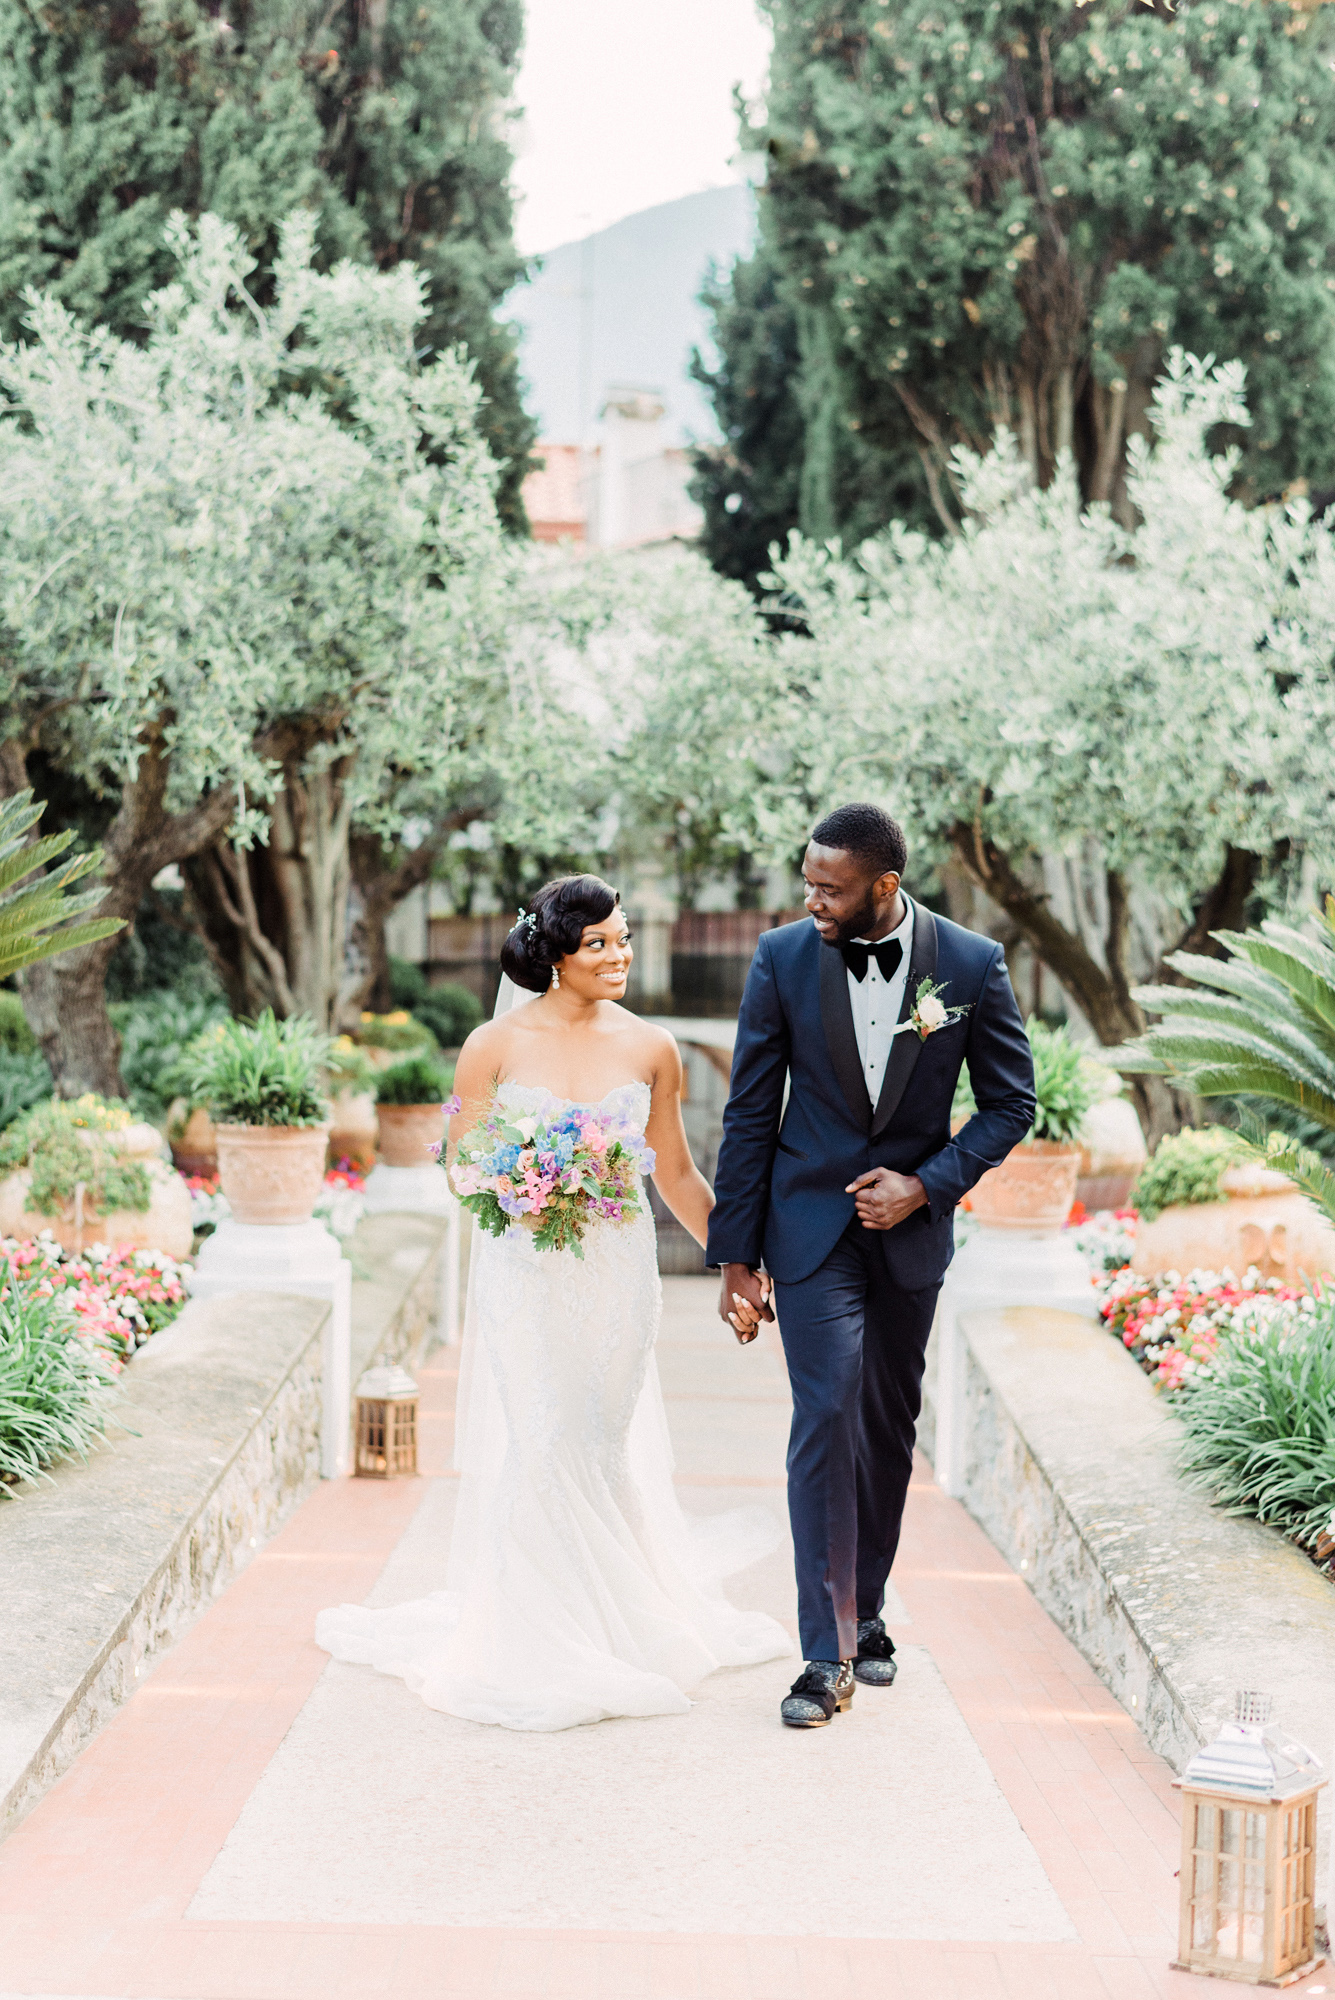 onome efe wedding couple walking holding hands